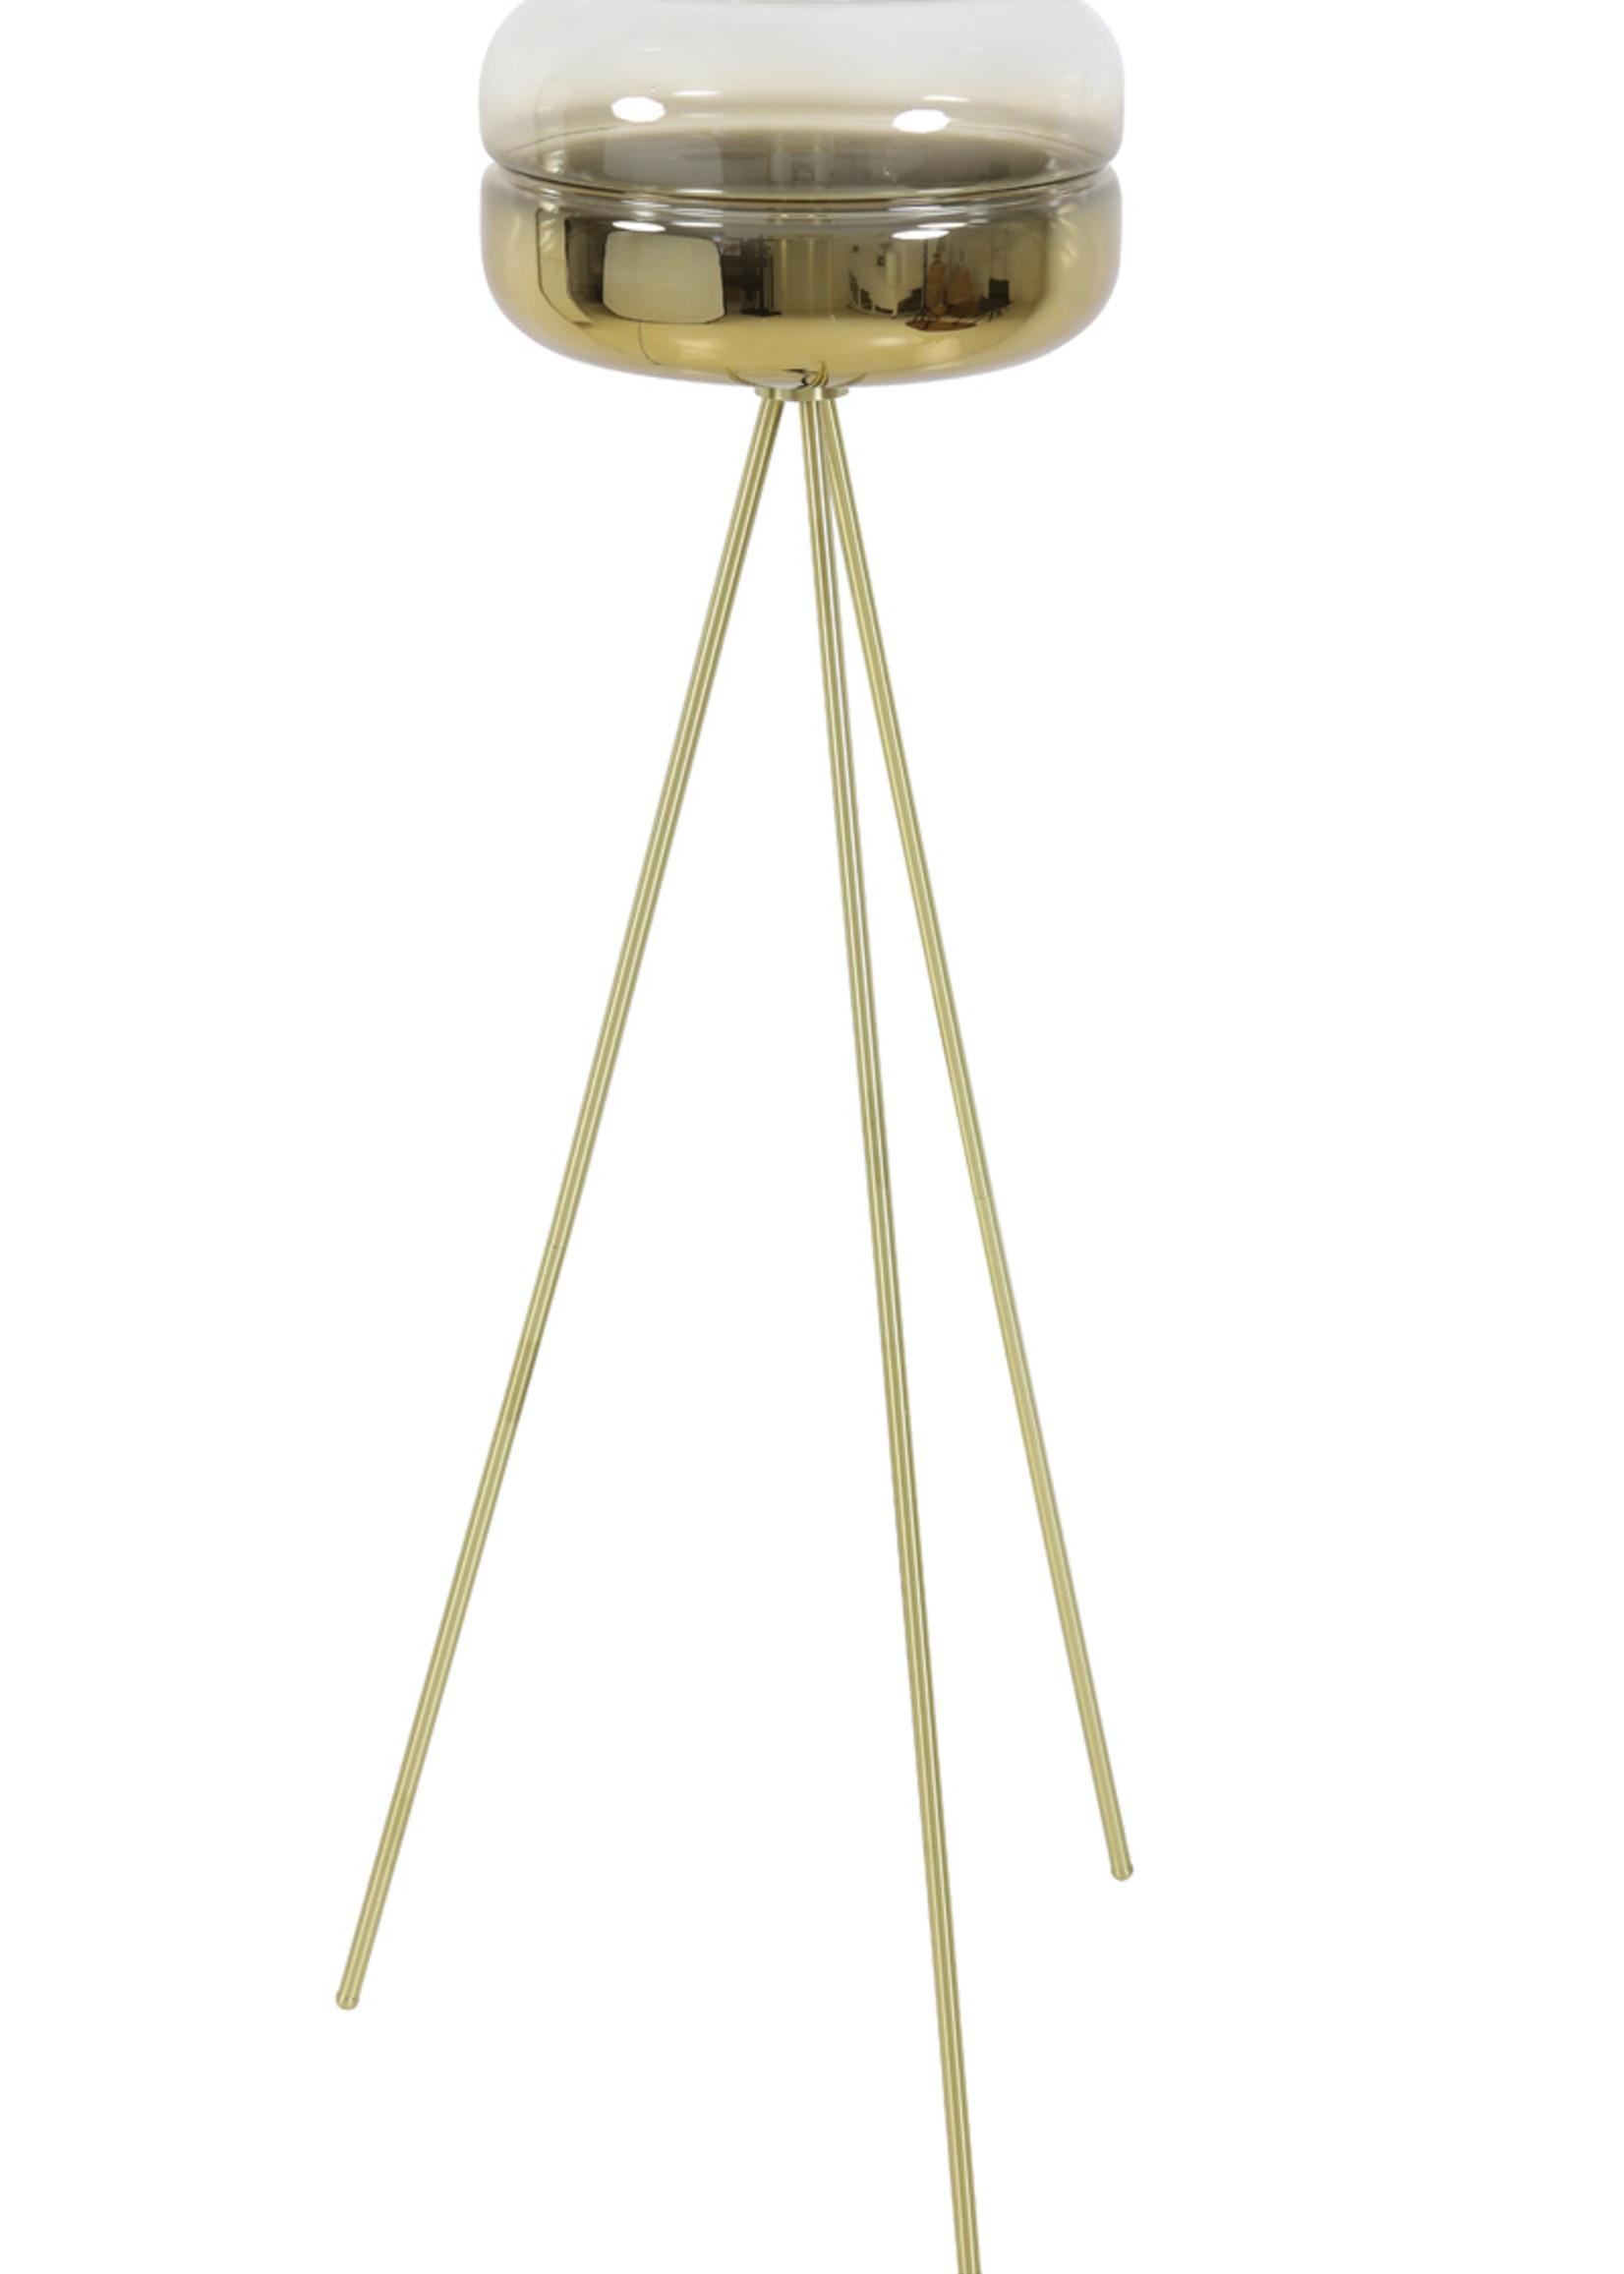 Light & Living Vloerlamp tripod Ø40x140 cm CHERLE glas goud+mat goud